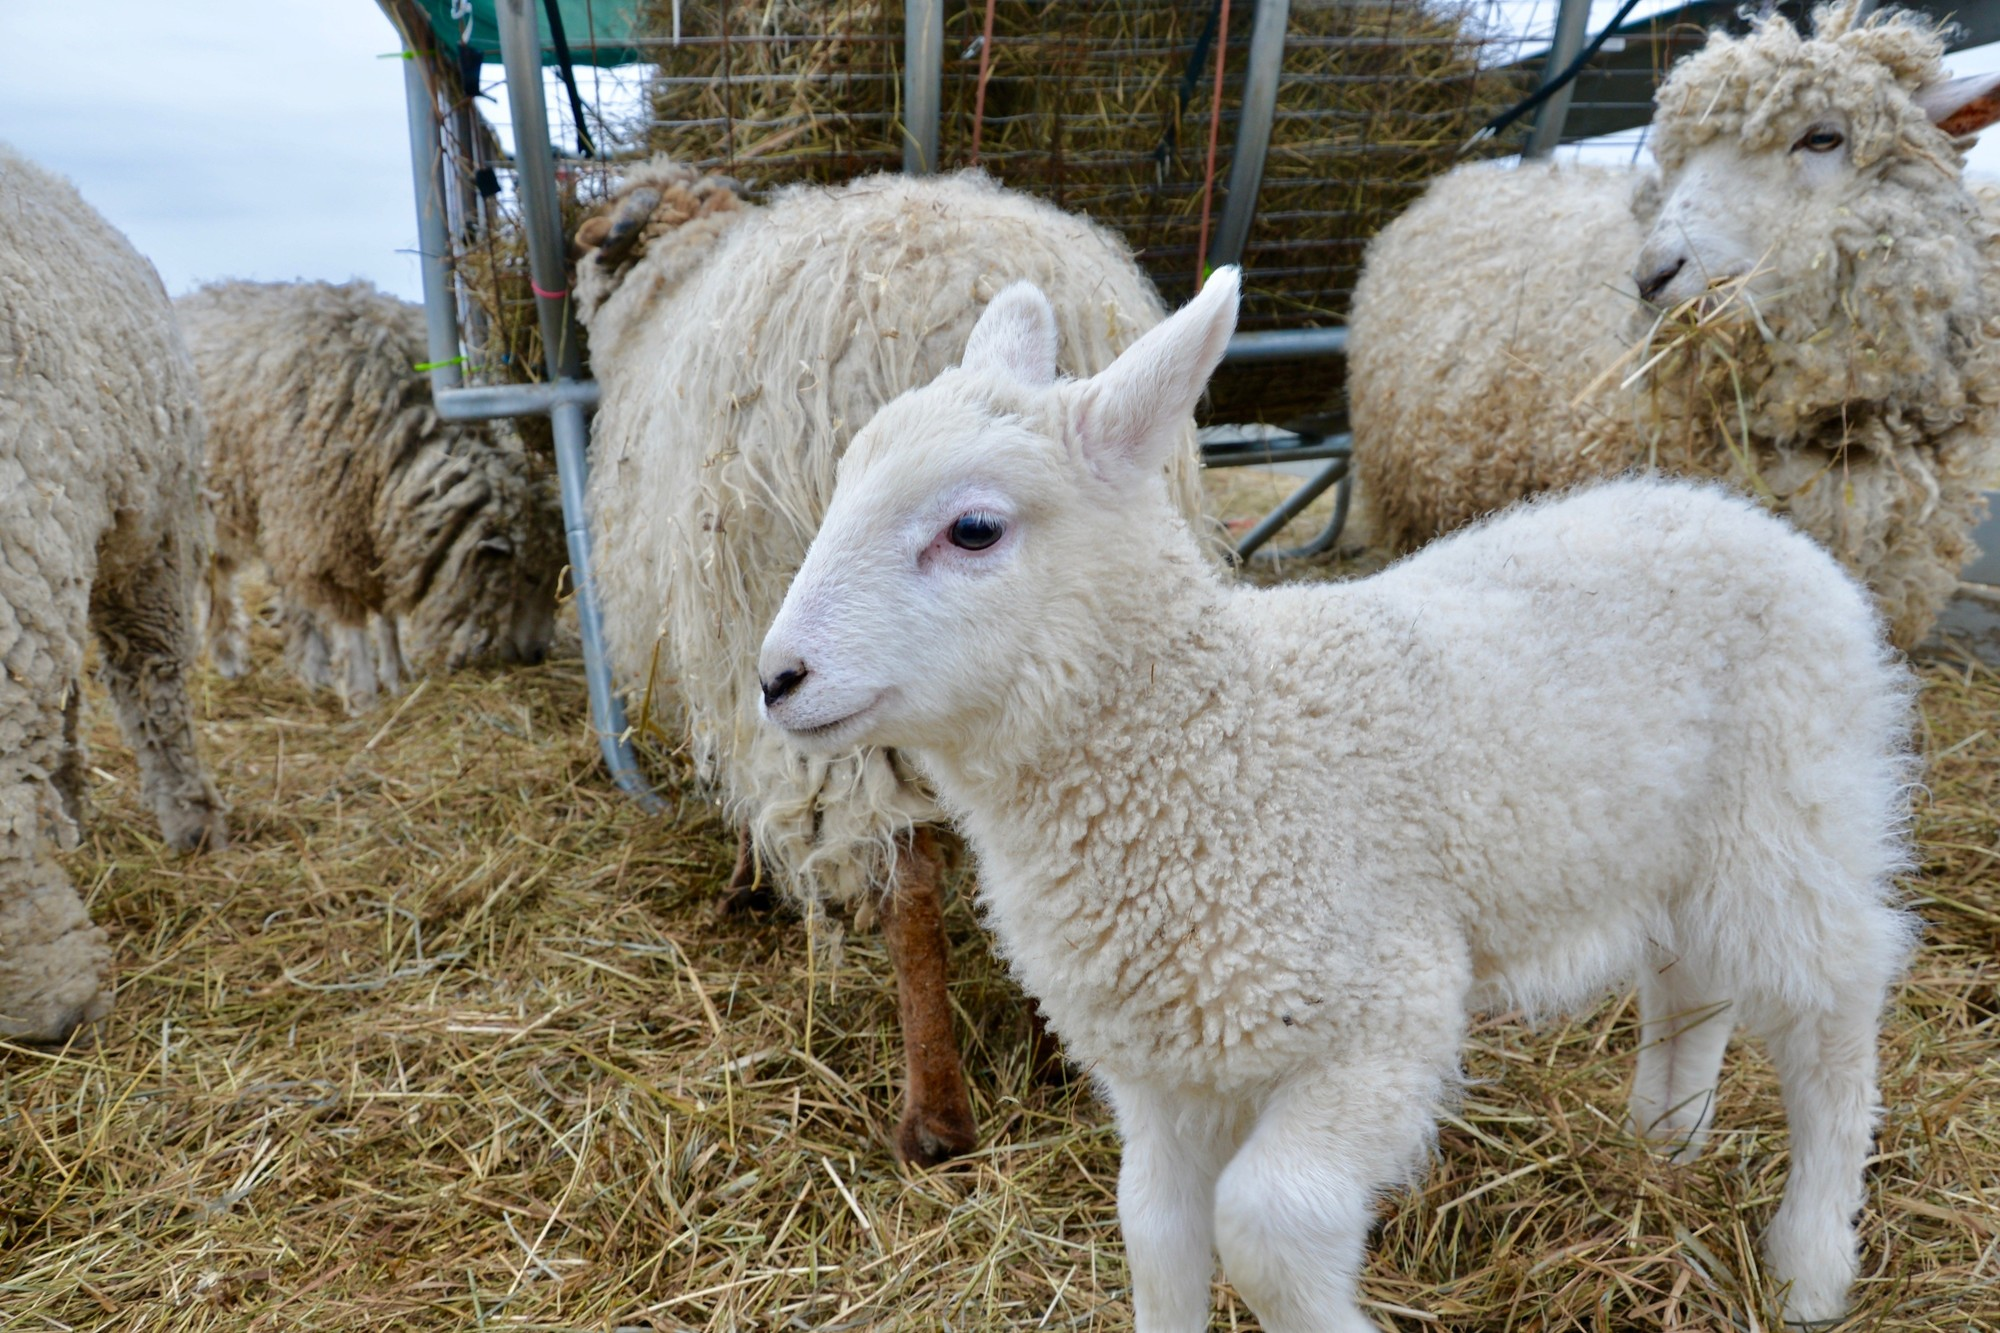 Hugo the baby goat